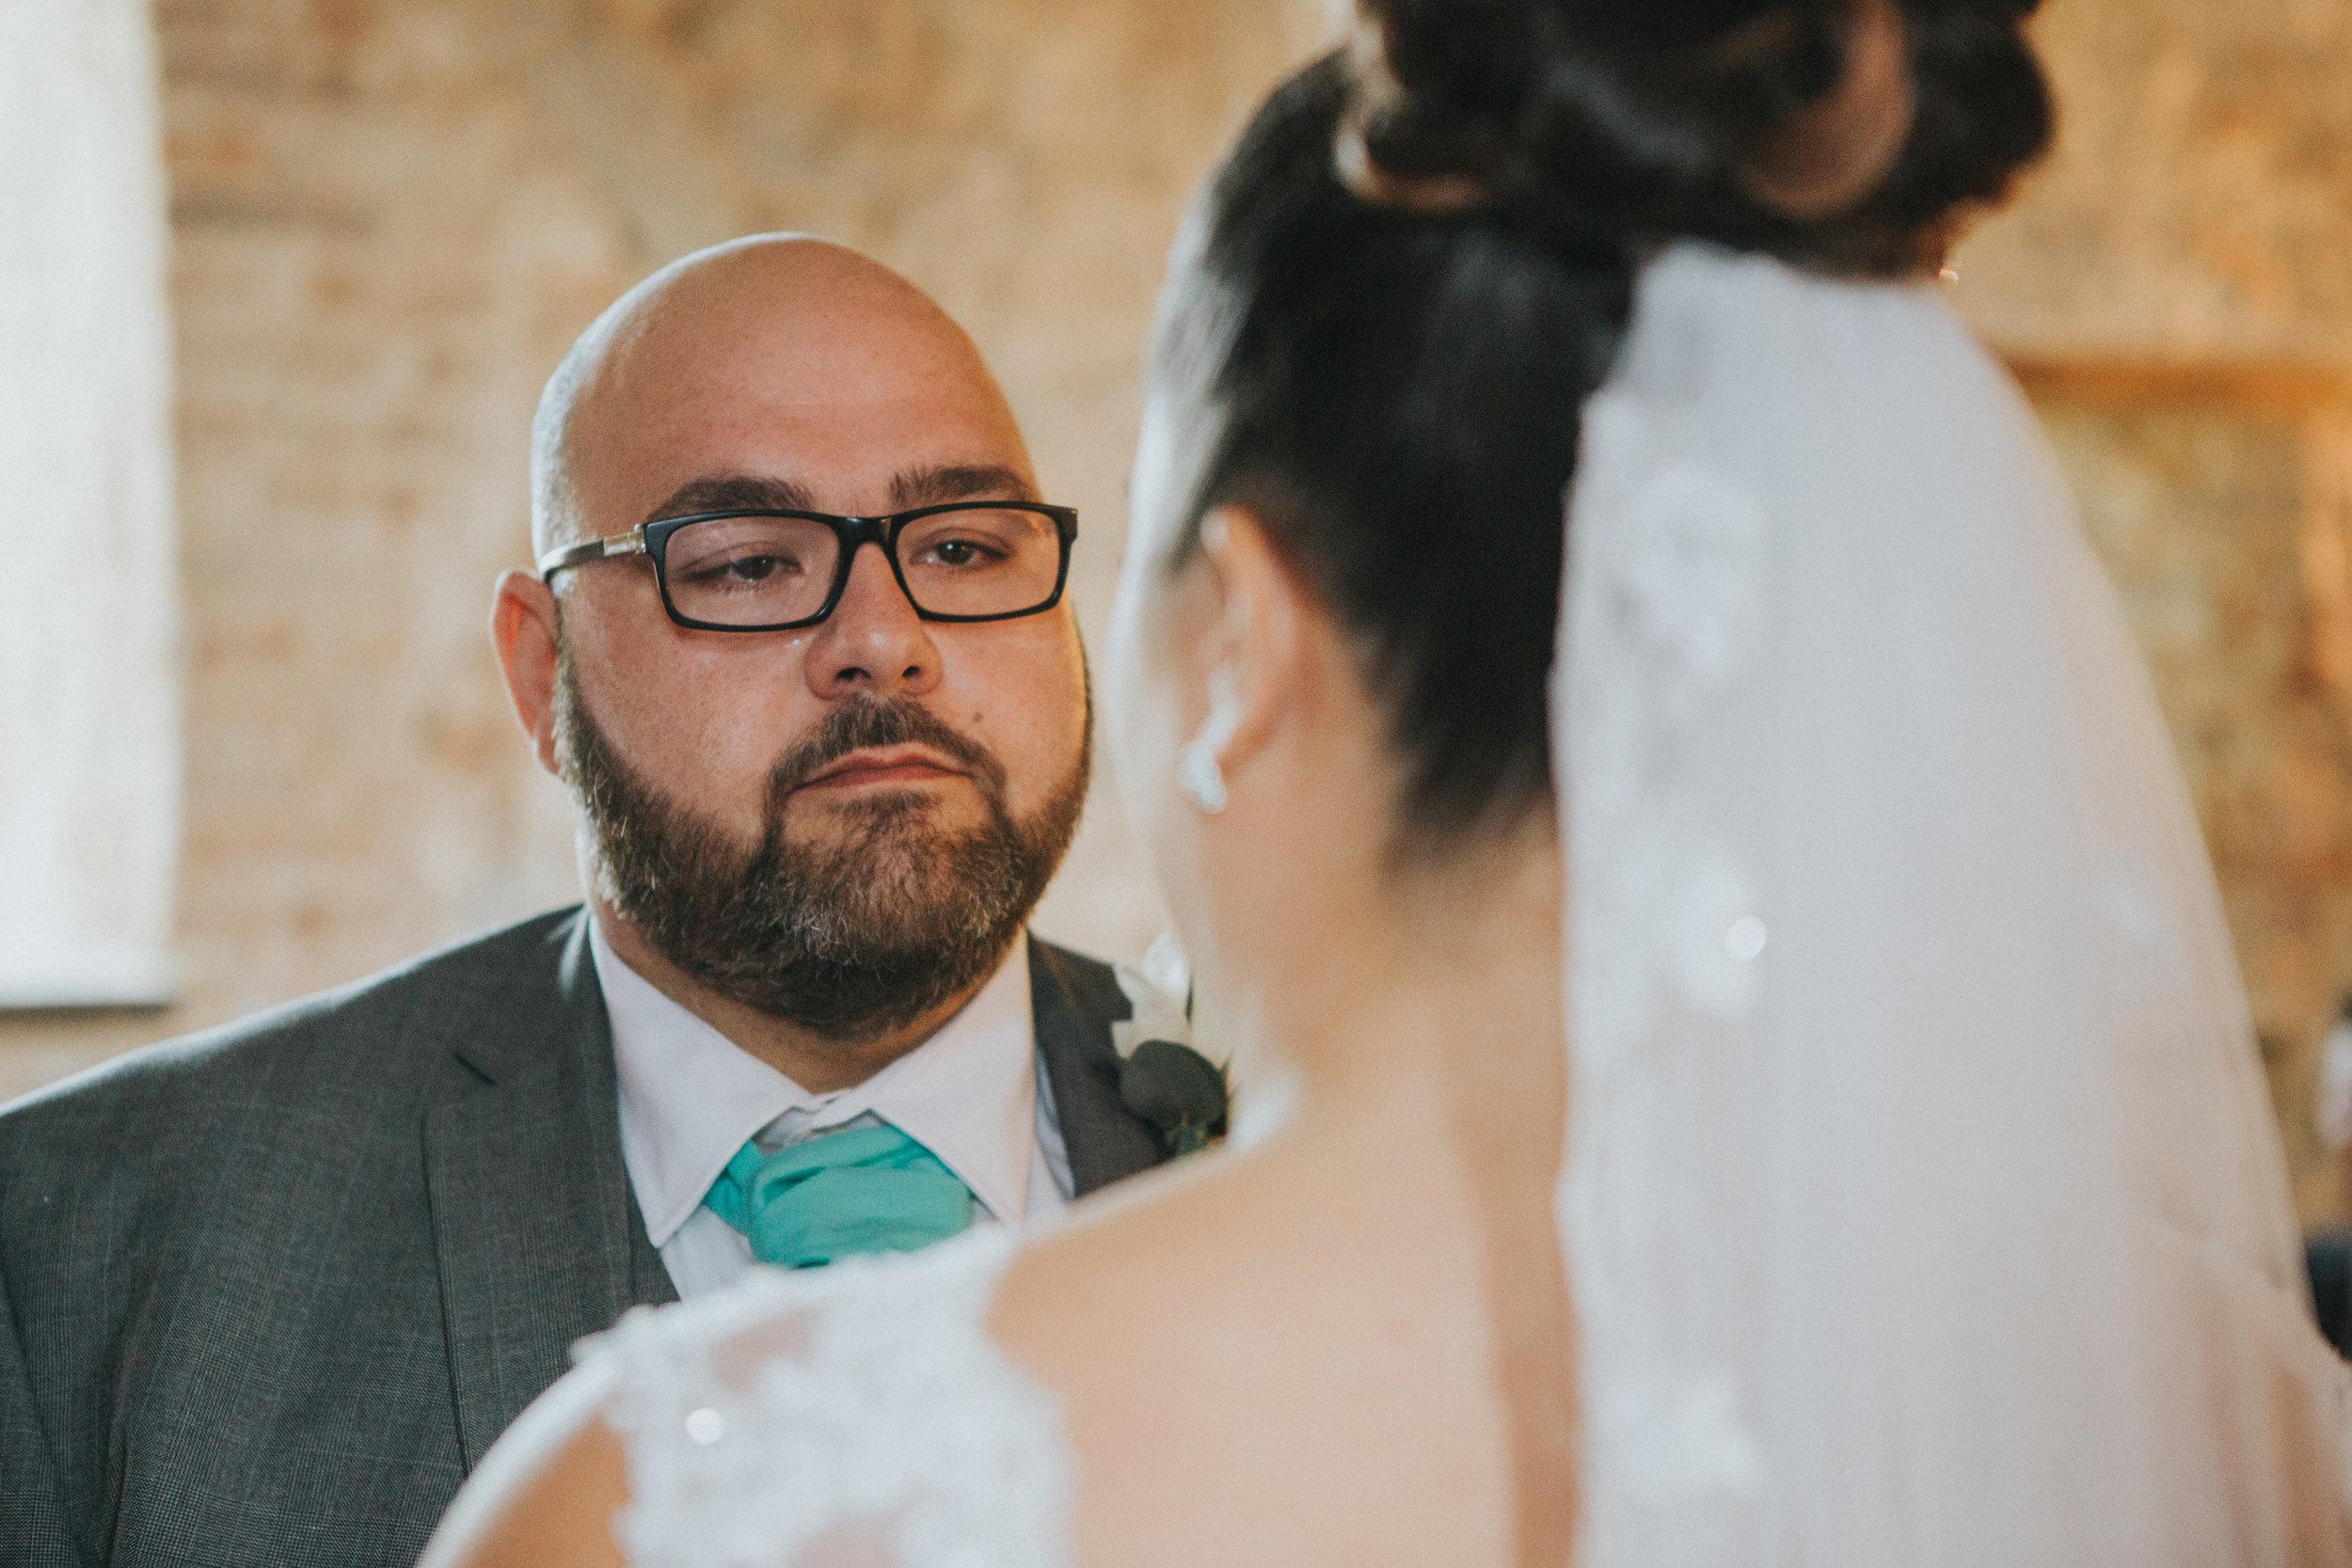 westenhangar-castle-kent-london-wedding-photography-38